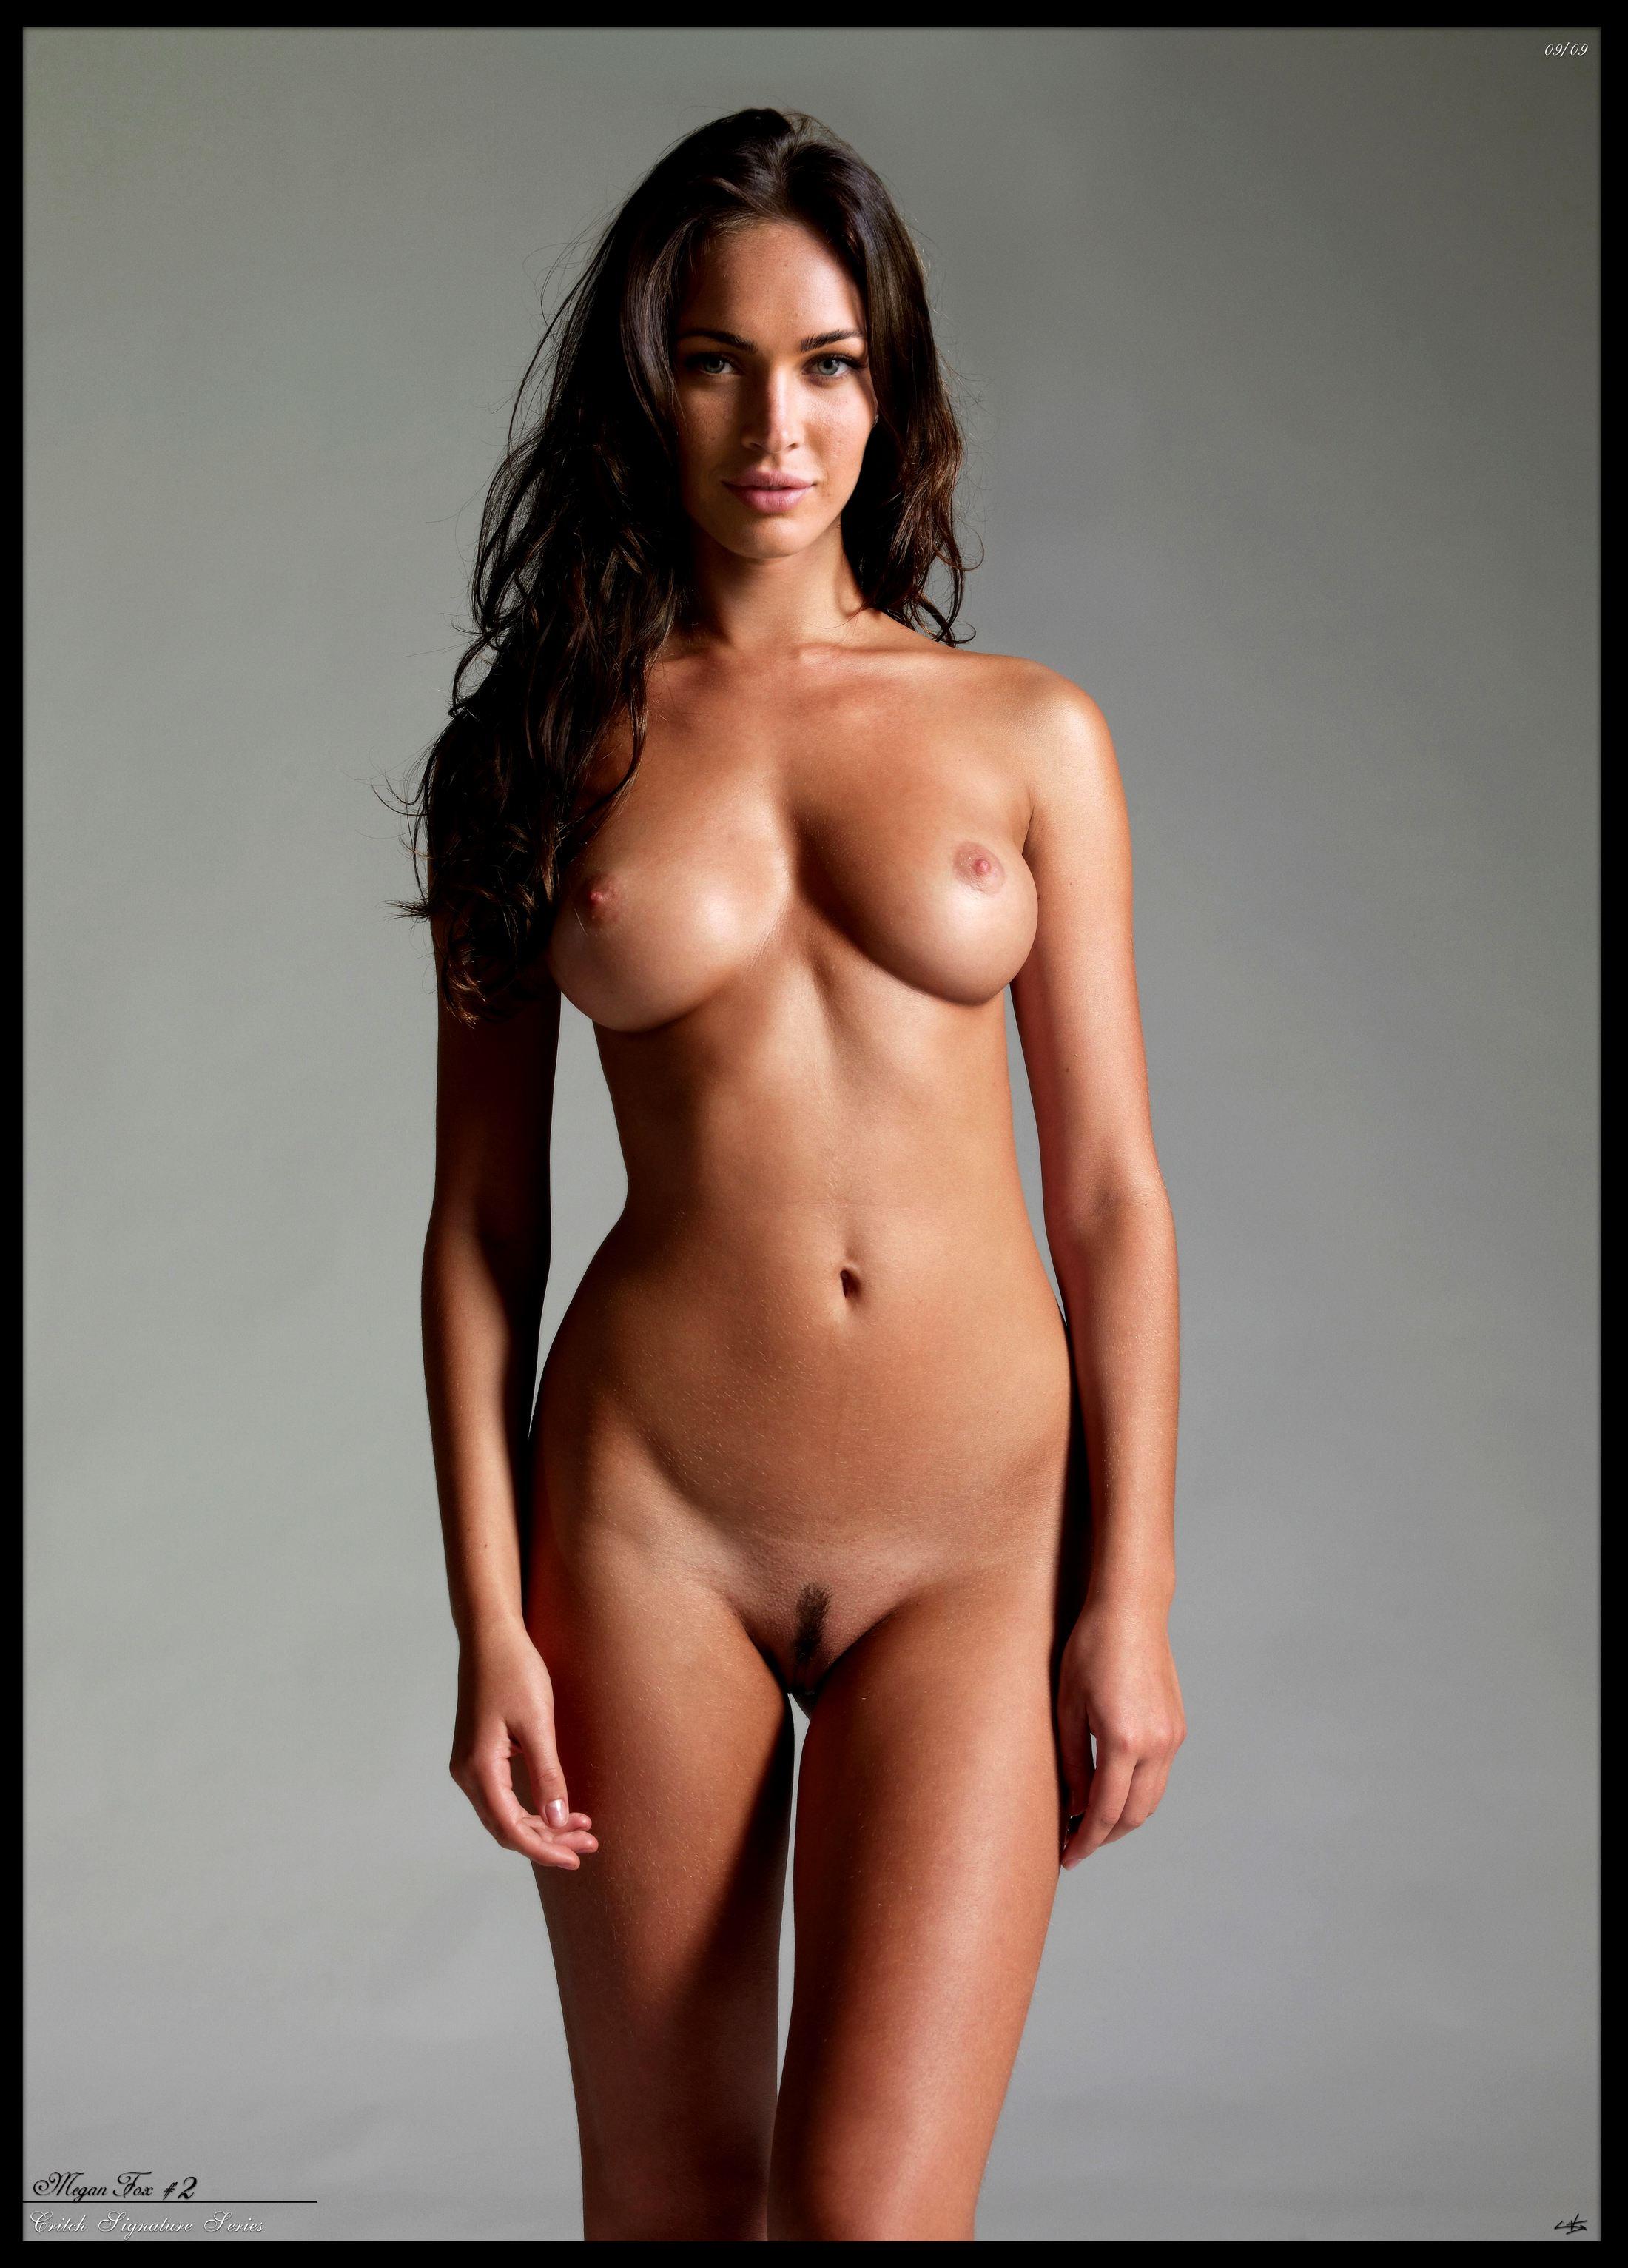 Naked Pics Of Megan Fox Photos